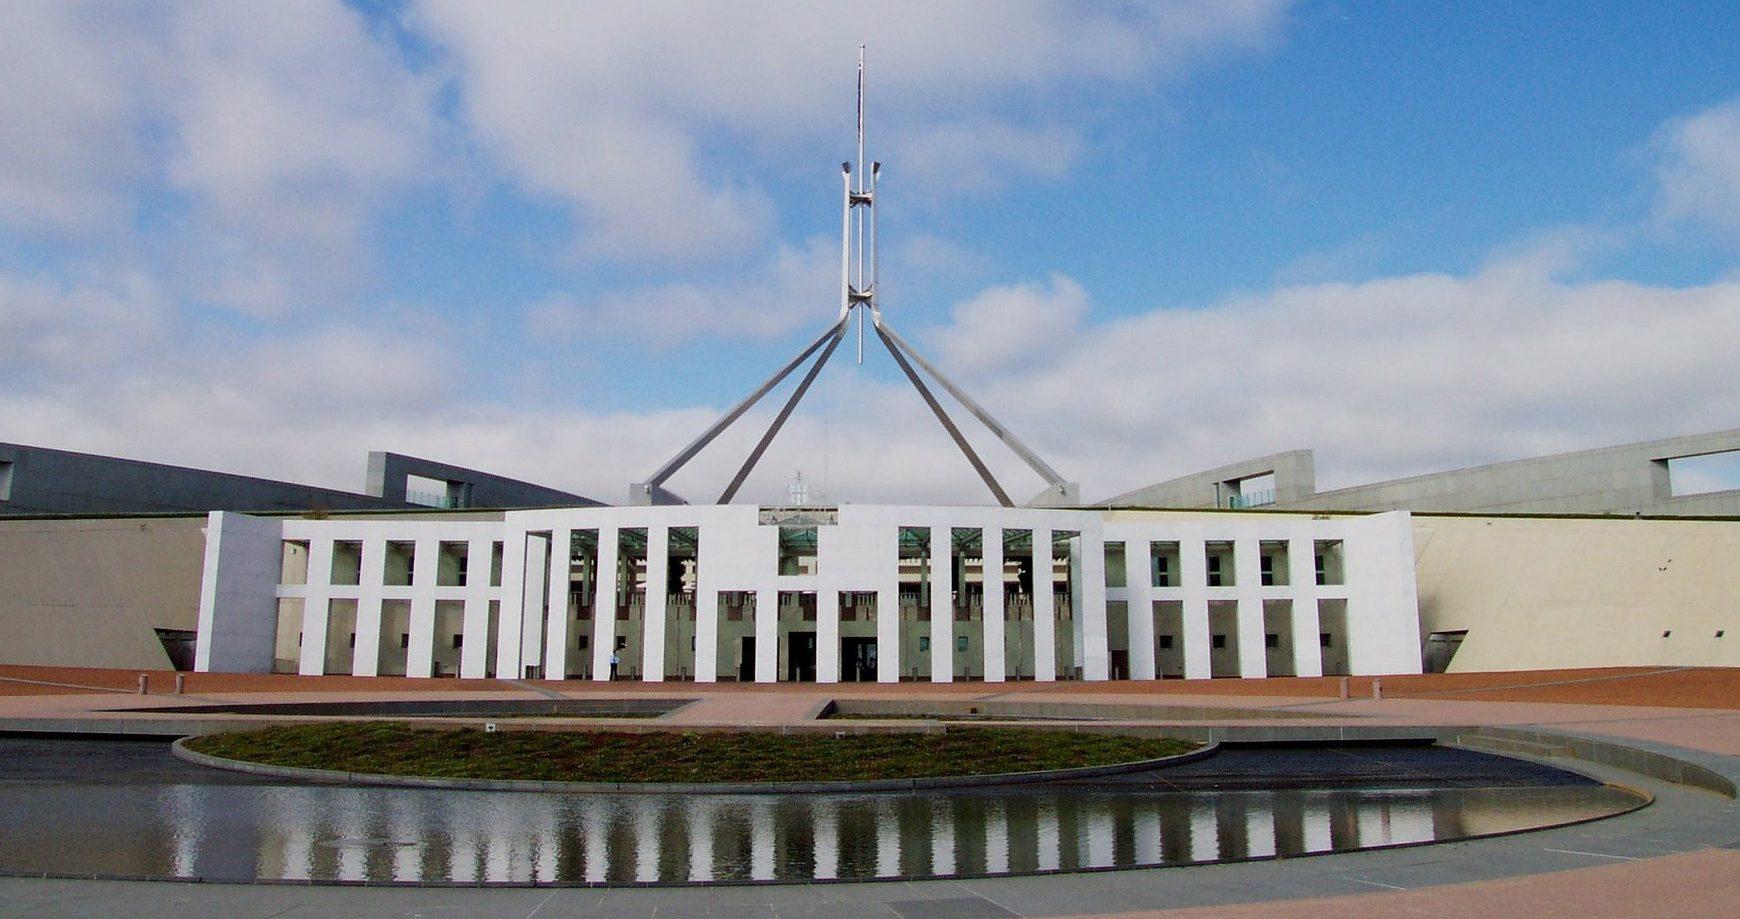 Za kybernetickým útokom na austrálsky parlament stála Čína